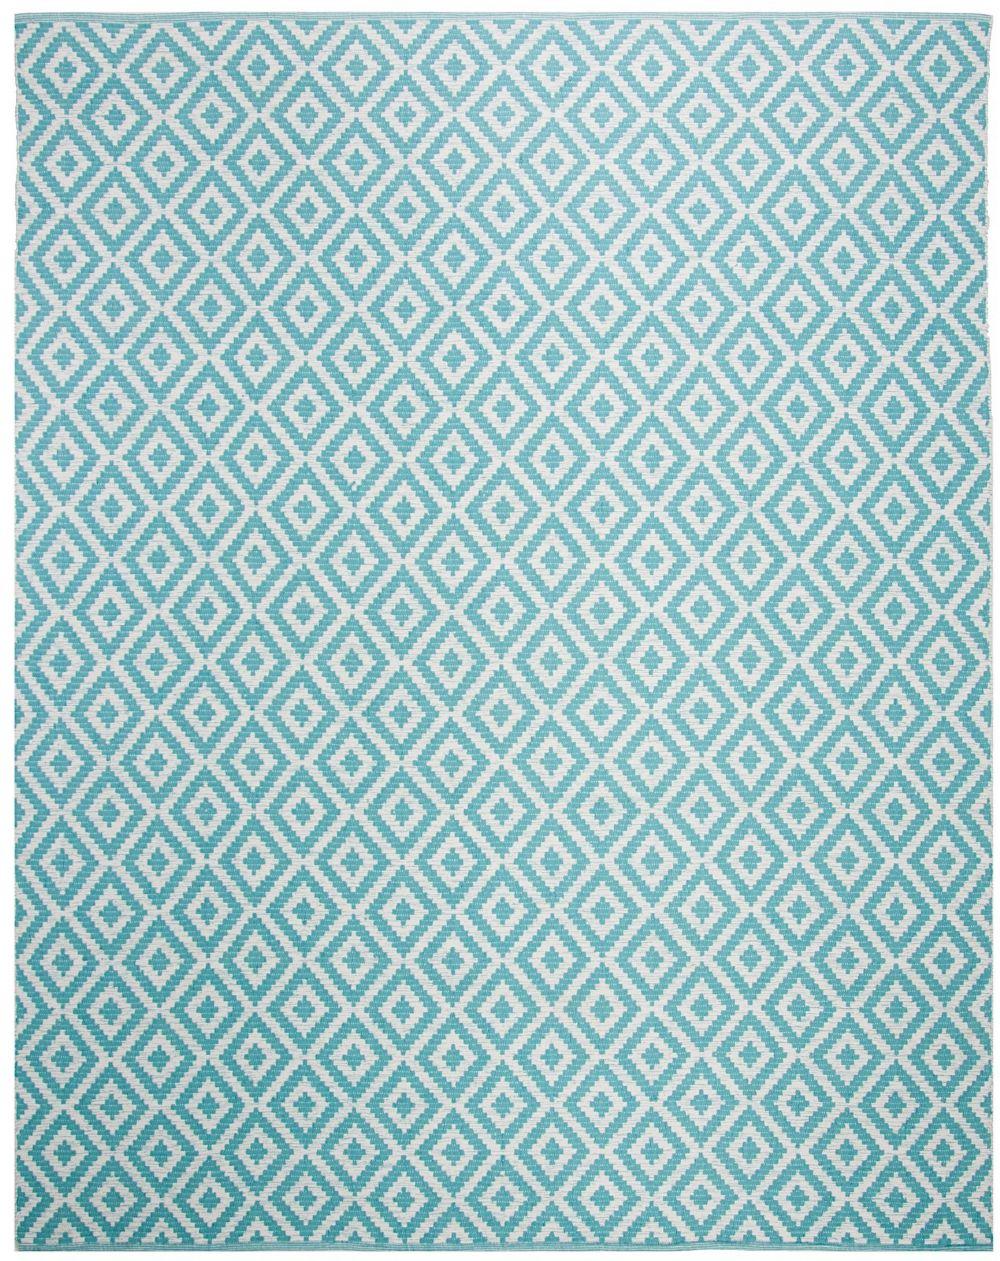 safavieh montauk contemporary area rug collection